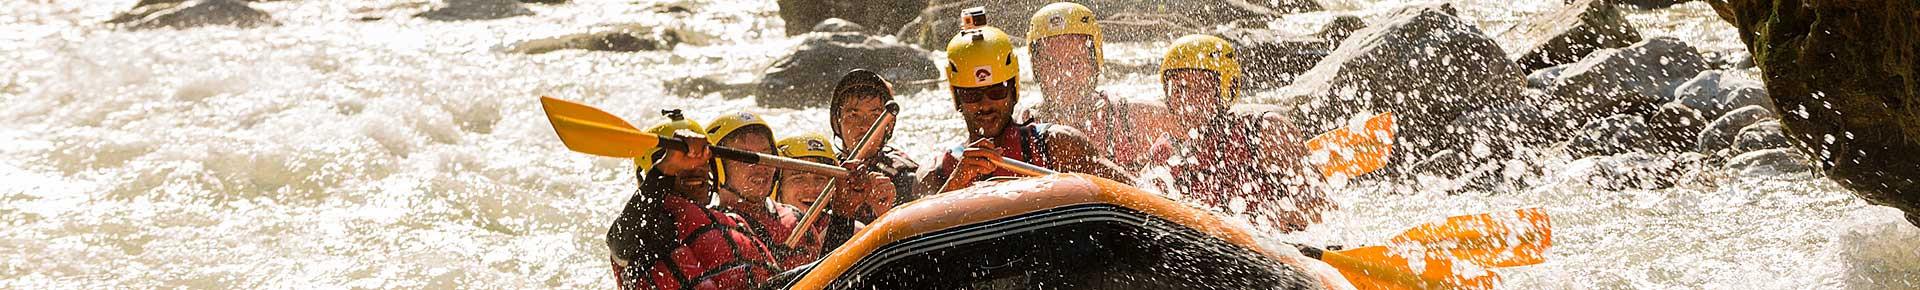 Rafting sur la Dranse